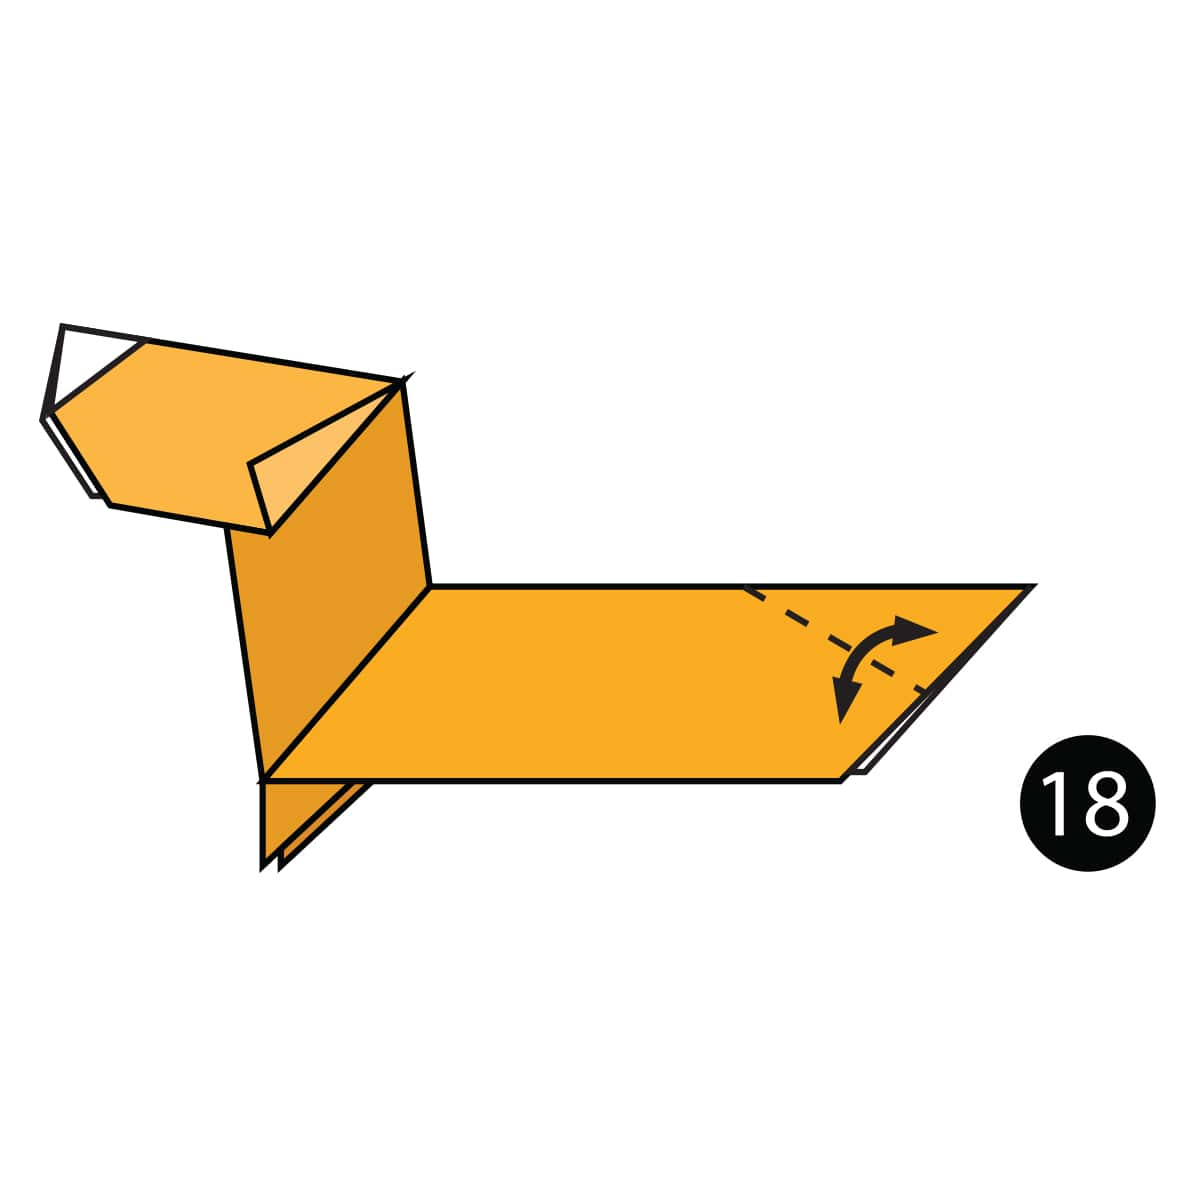 Dachshund Step 18